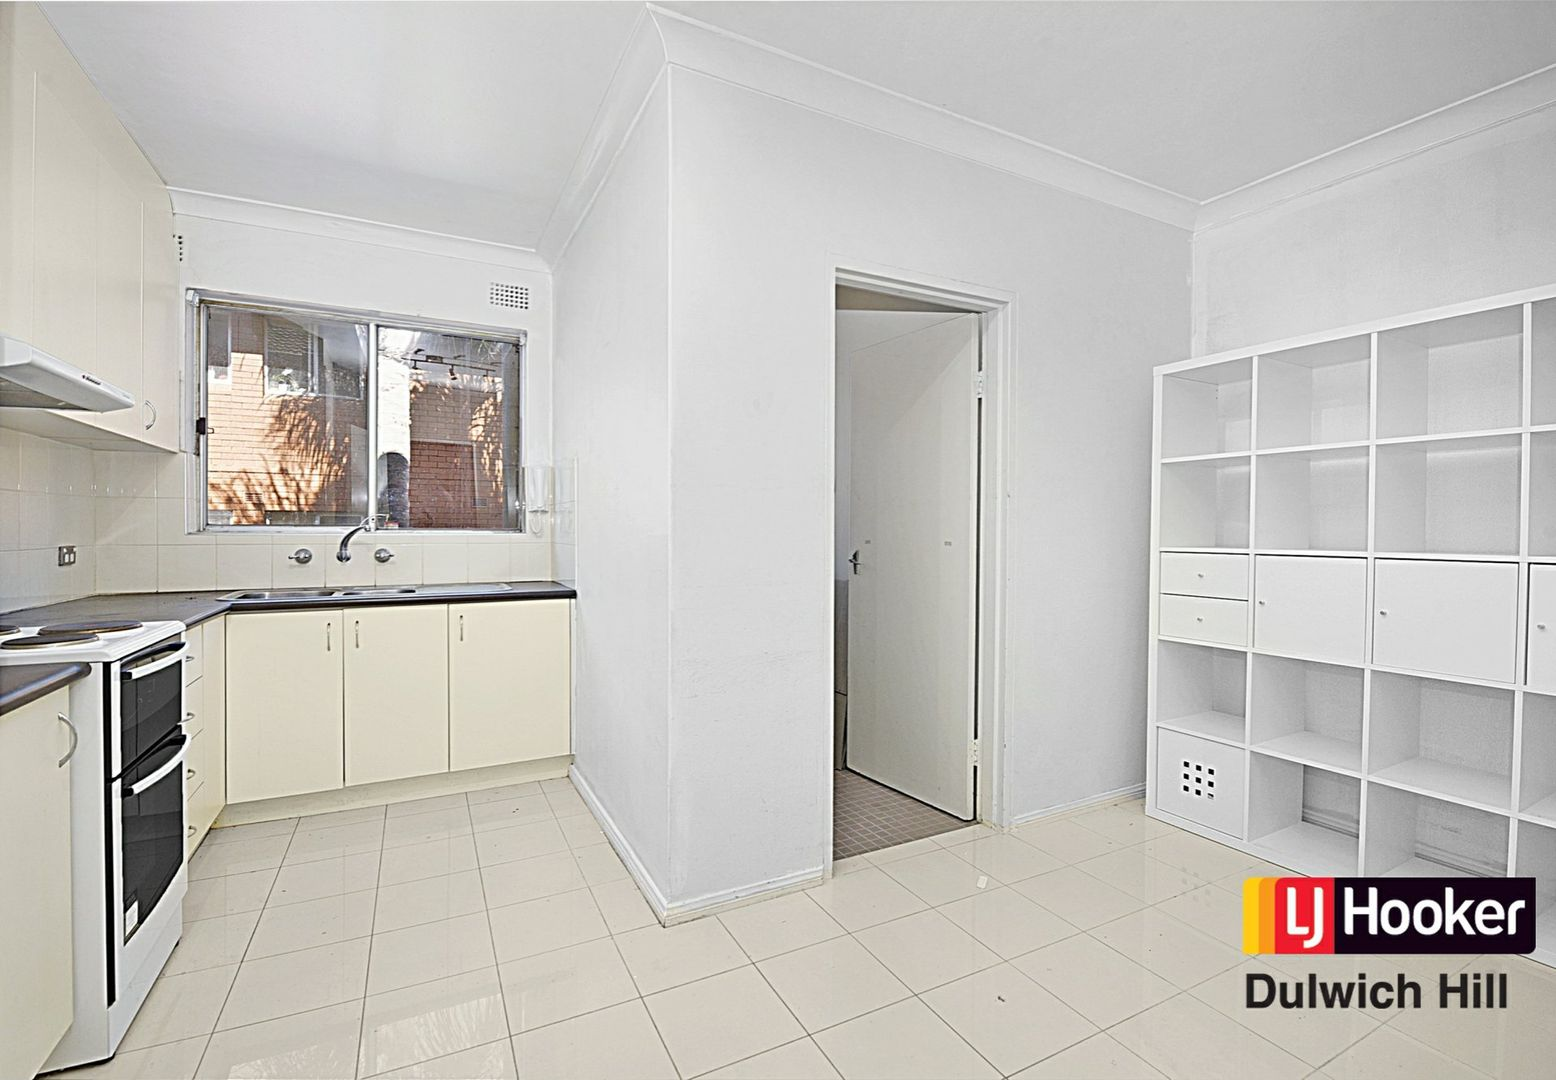 5/23 Myra Rd, Dulwich Hill NSW 2203, Image 0